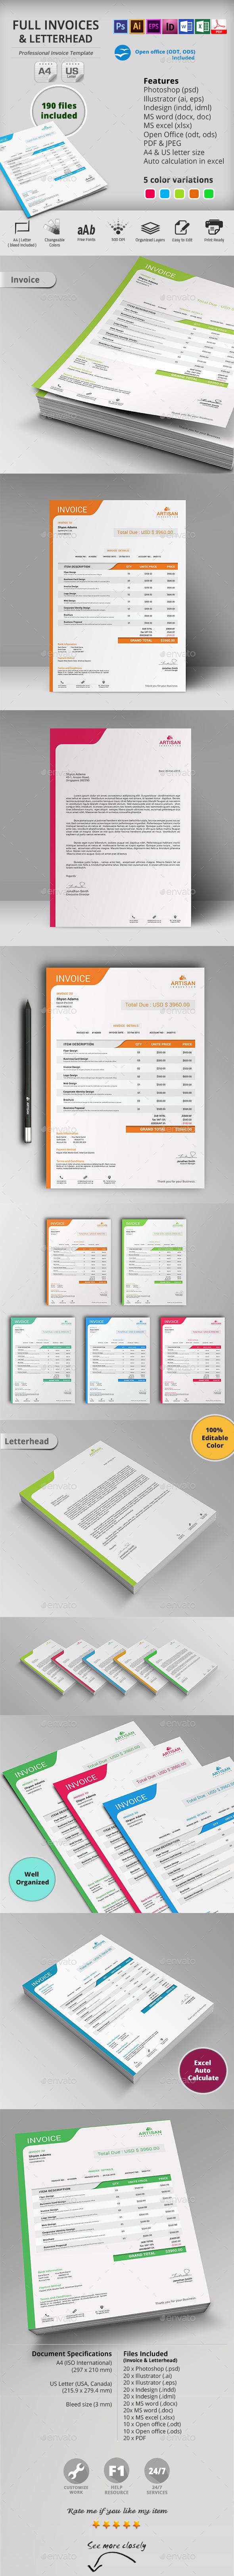 GraphicRiver Invoice with Letterhead 10543282